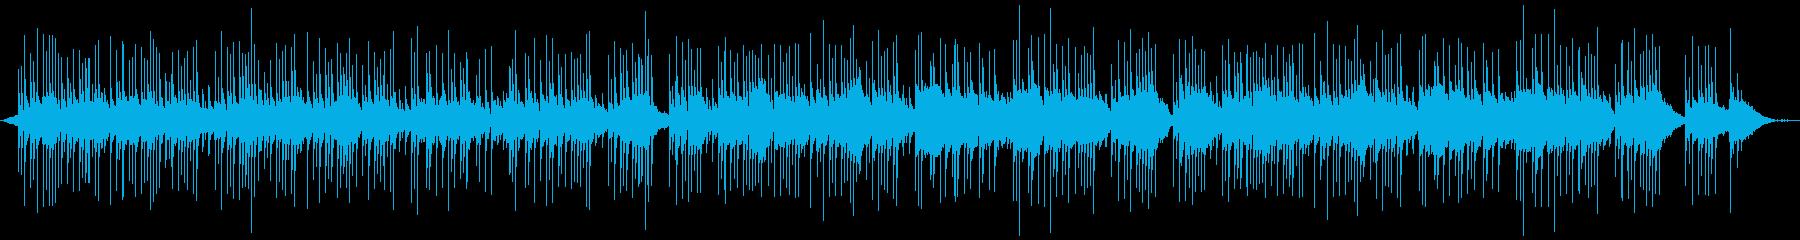 Sanshin tone reminiscent of the calm Okinawan sea's reproduced waveform